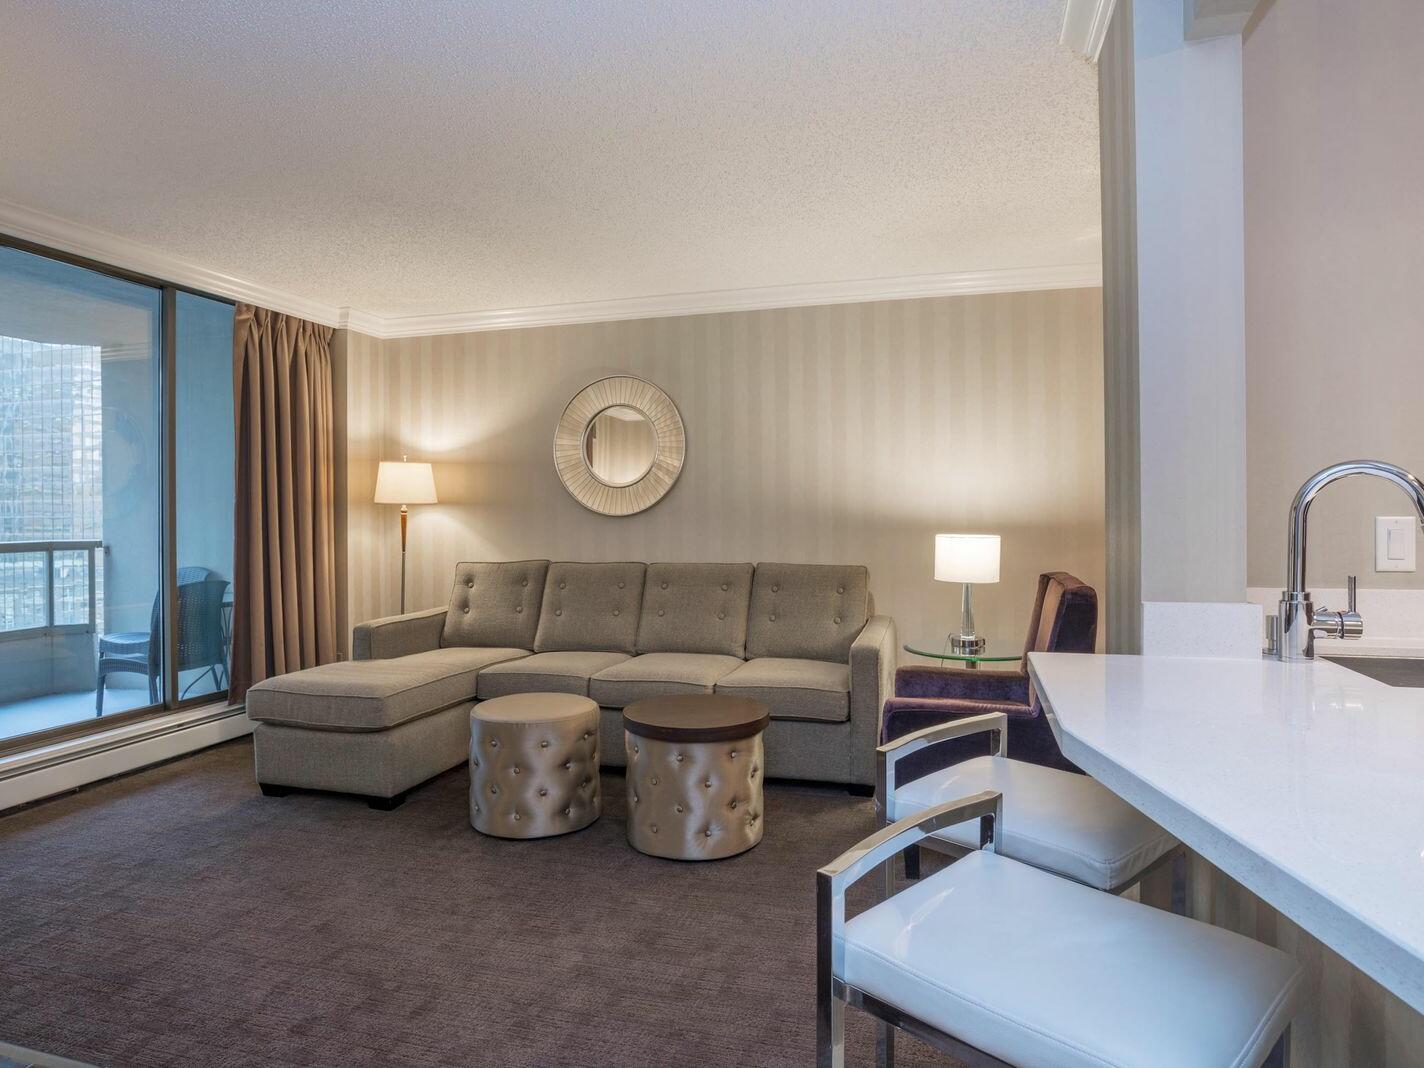 One BedroomDeluxe Suite - 1 King Bed  La Grande Résidence